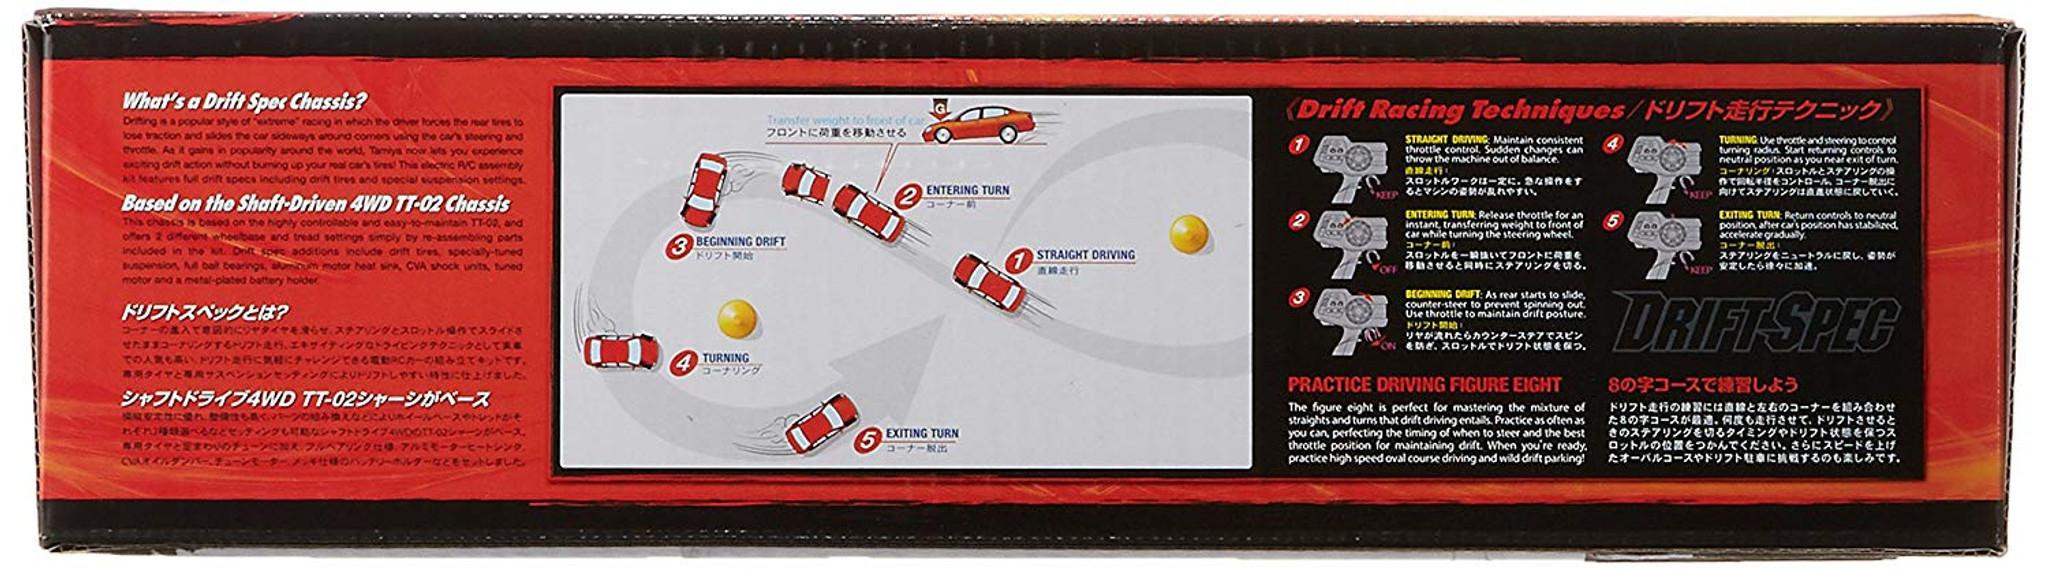 Tamiya 58584 Drift Spec TT-02D Chassis Kit 1/10 Scale RC Car Series No 584